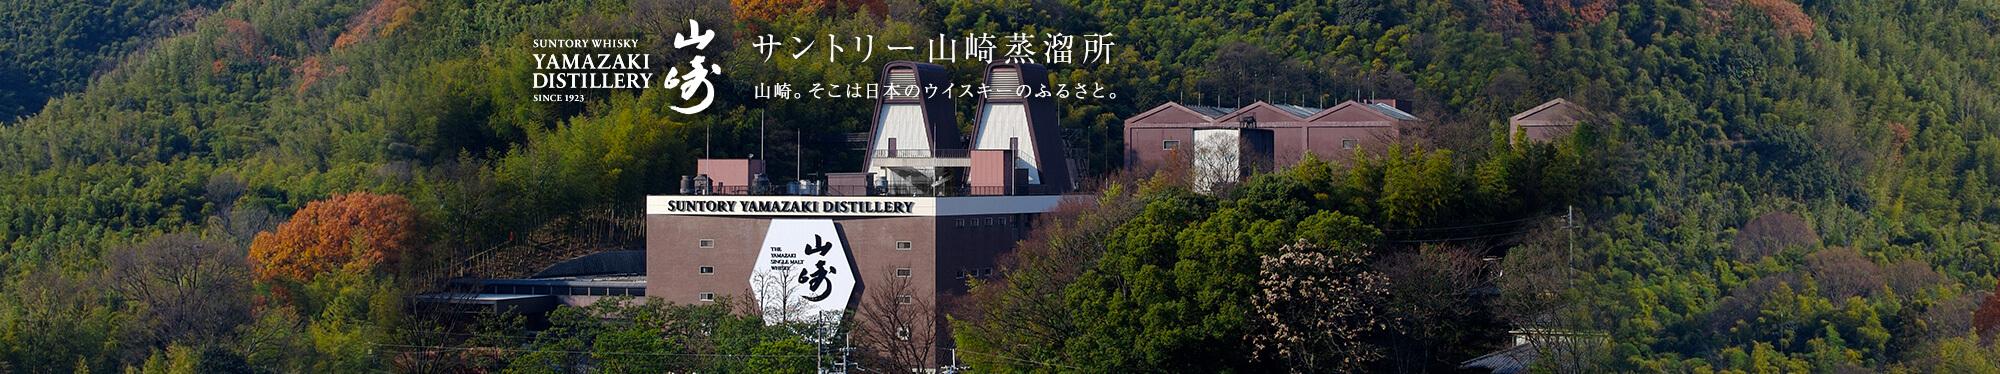 https://www.suntory.co.jp/factory/yamazaki/top/parts_main_visual/bnr/main_01.jpg